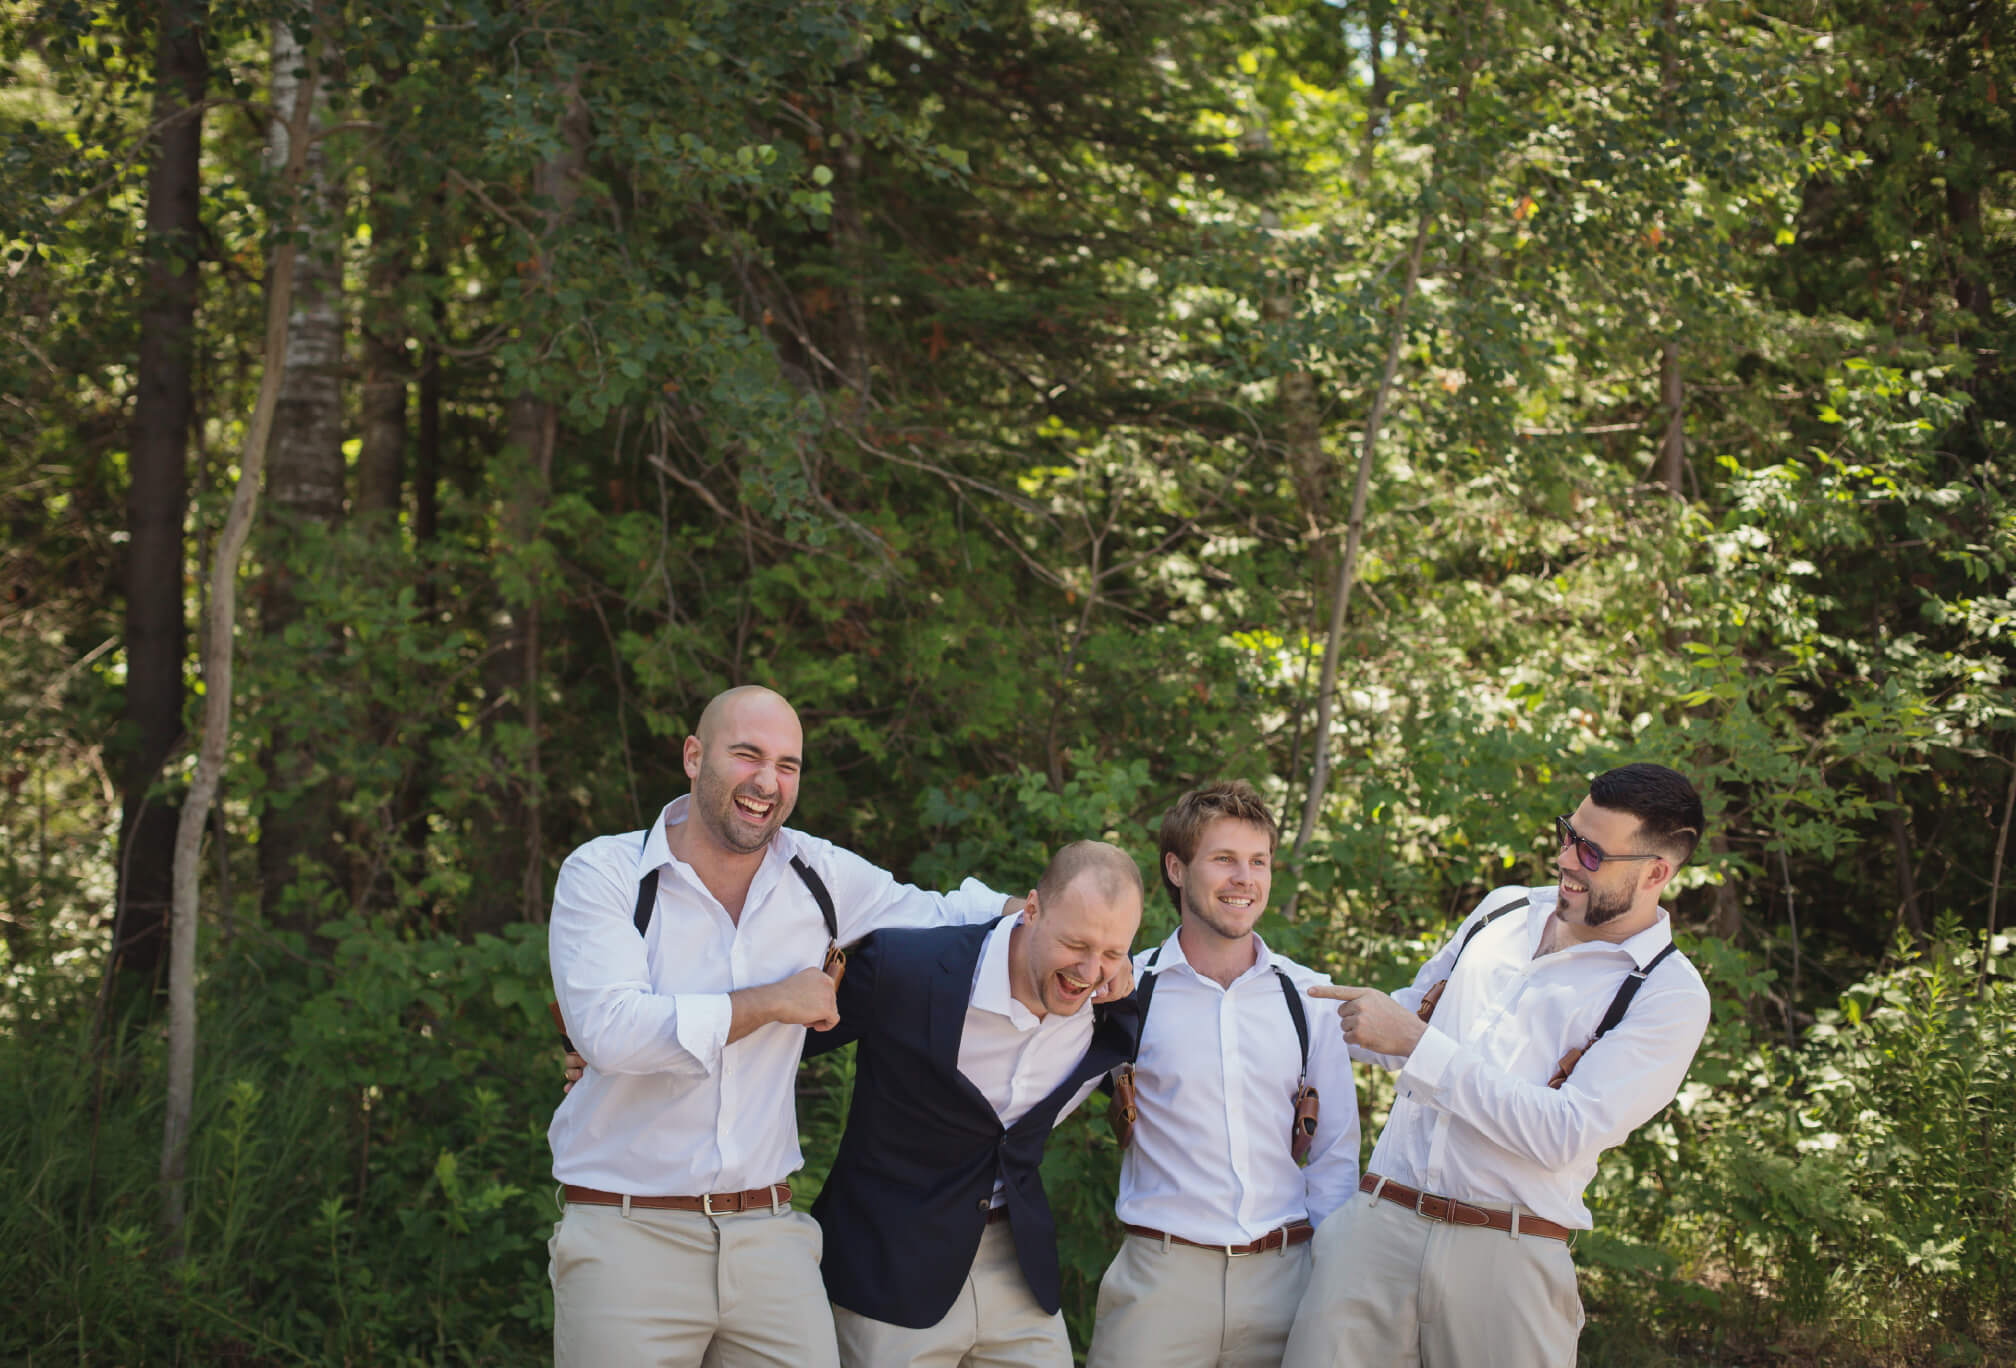 casual beach attire groomsmen